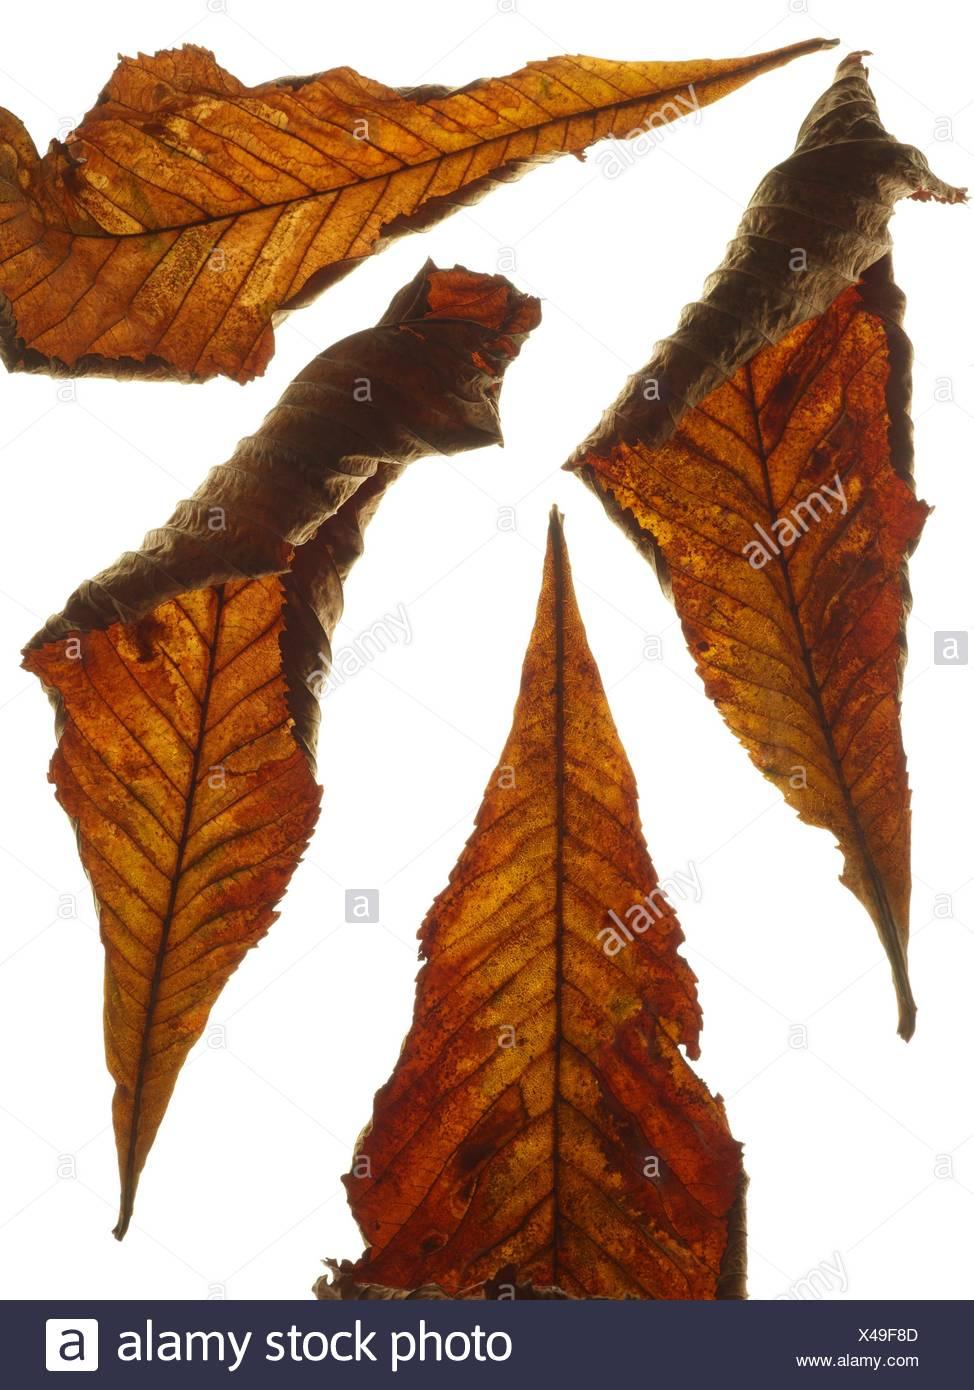 Horse chestnut (Aesculus hippocastanum) leaves, studio shot. - Stock Image